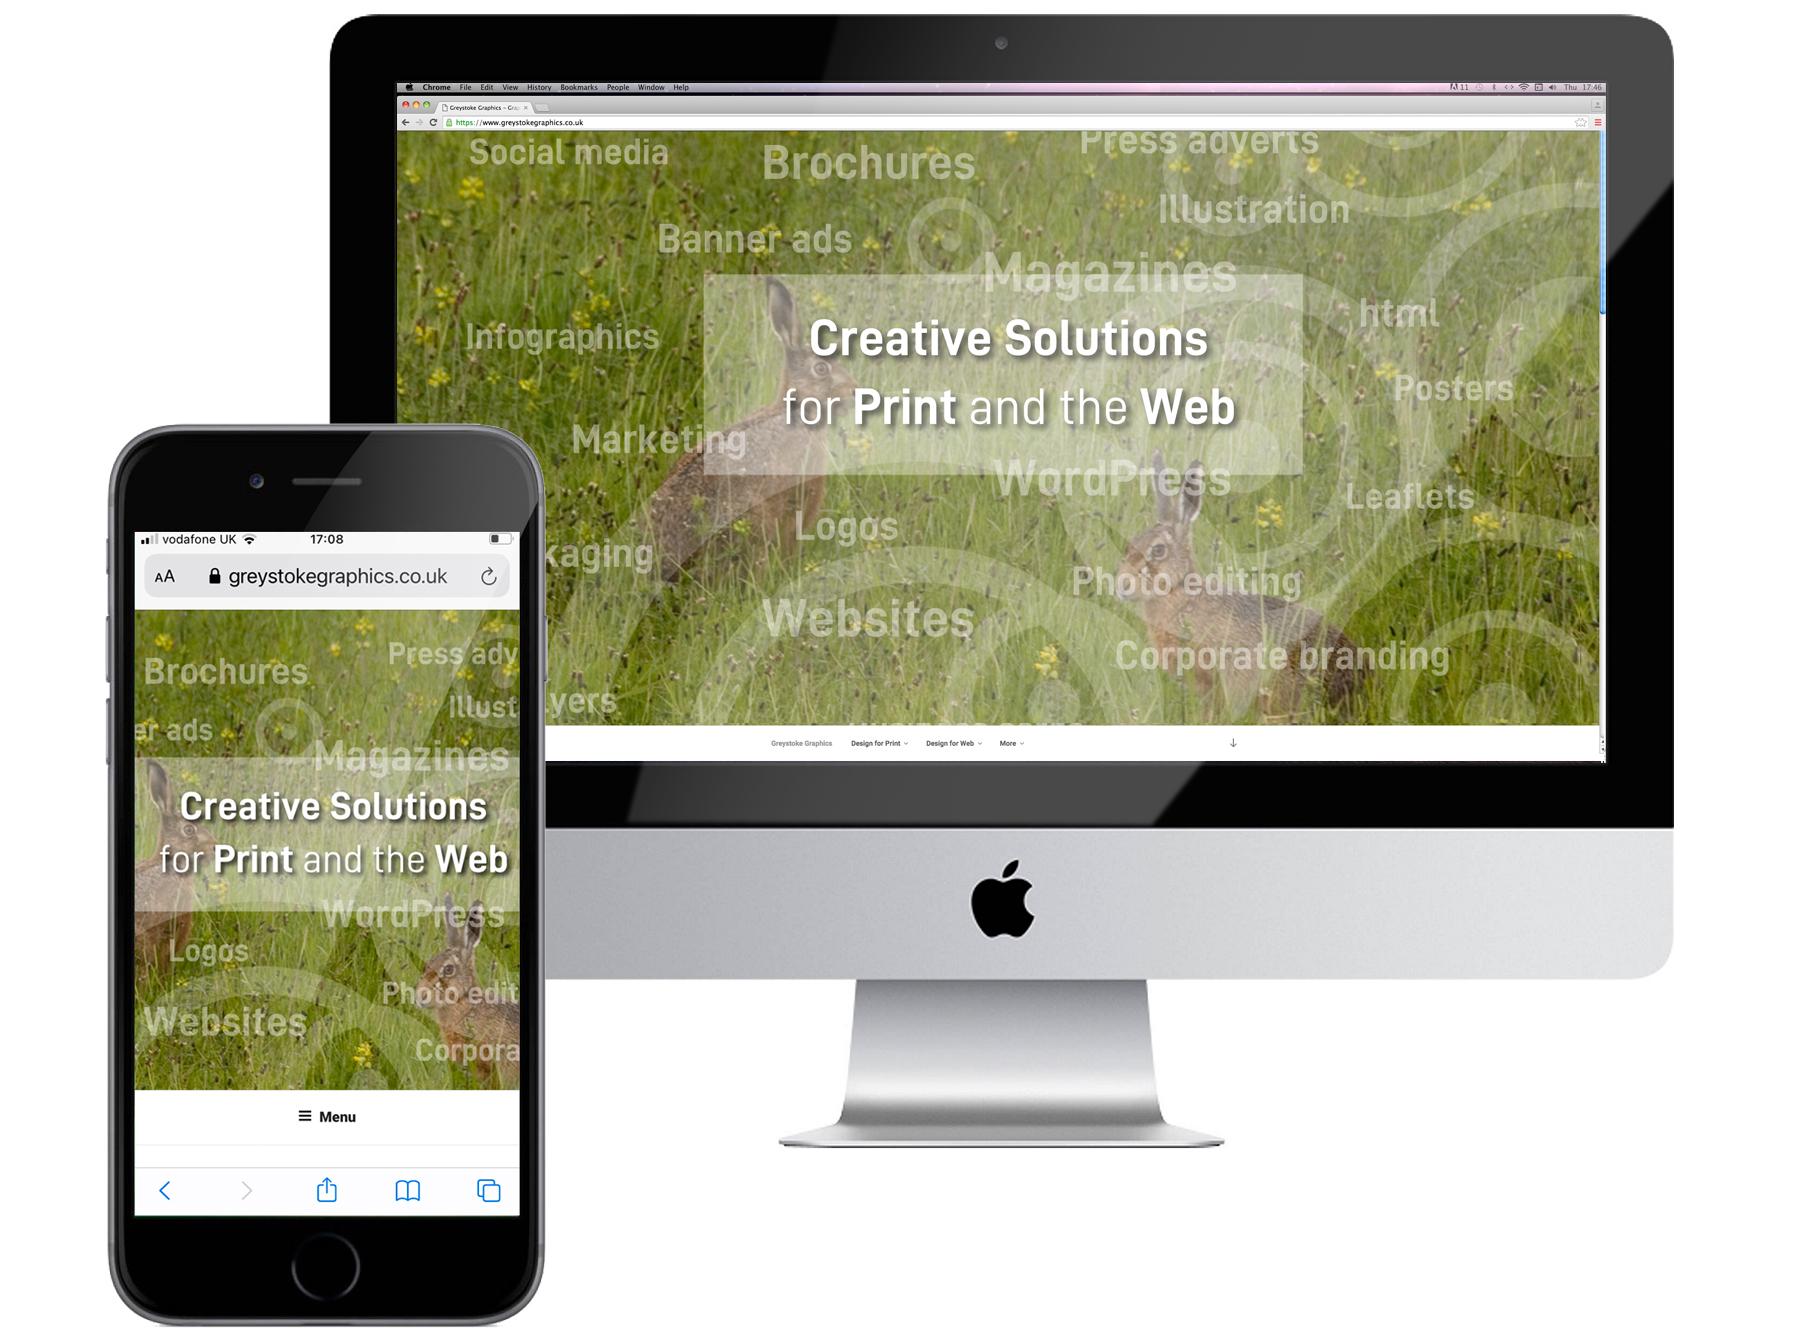 iMac and iPhone screens